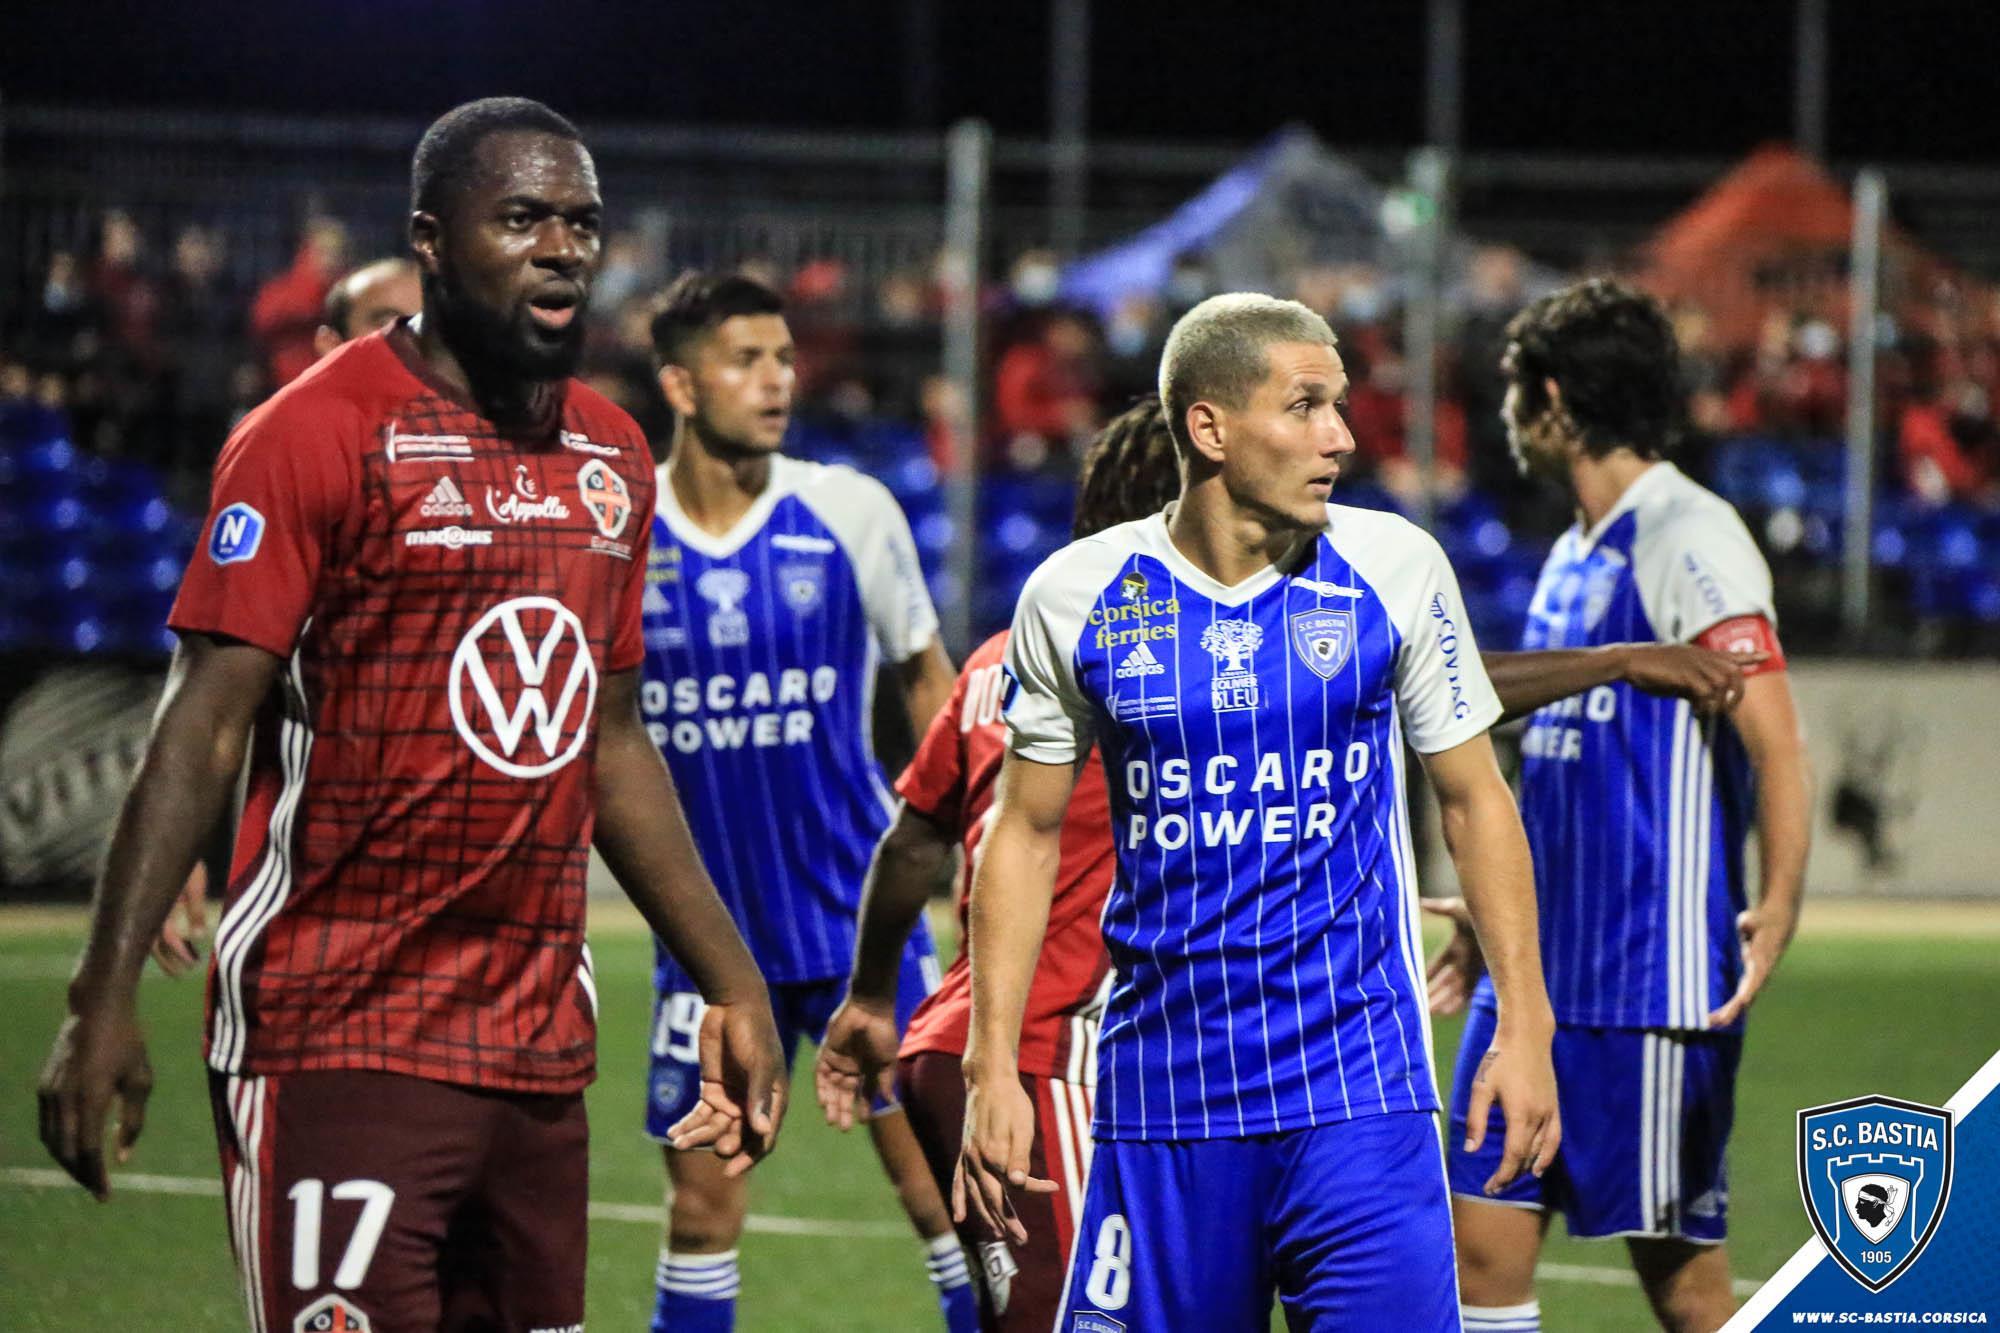 Kévin SCHUR | Sporting Club Bastia